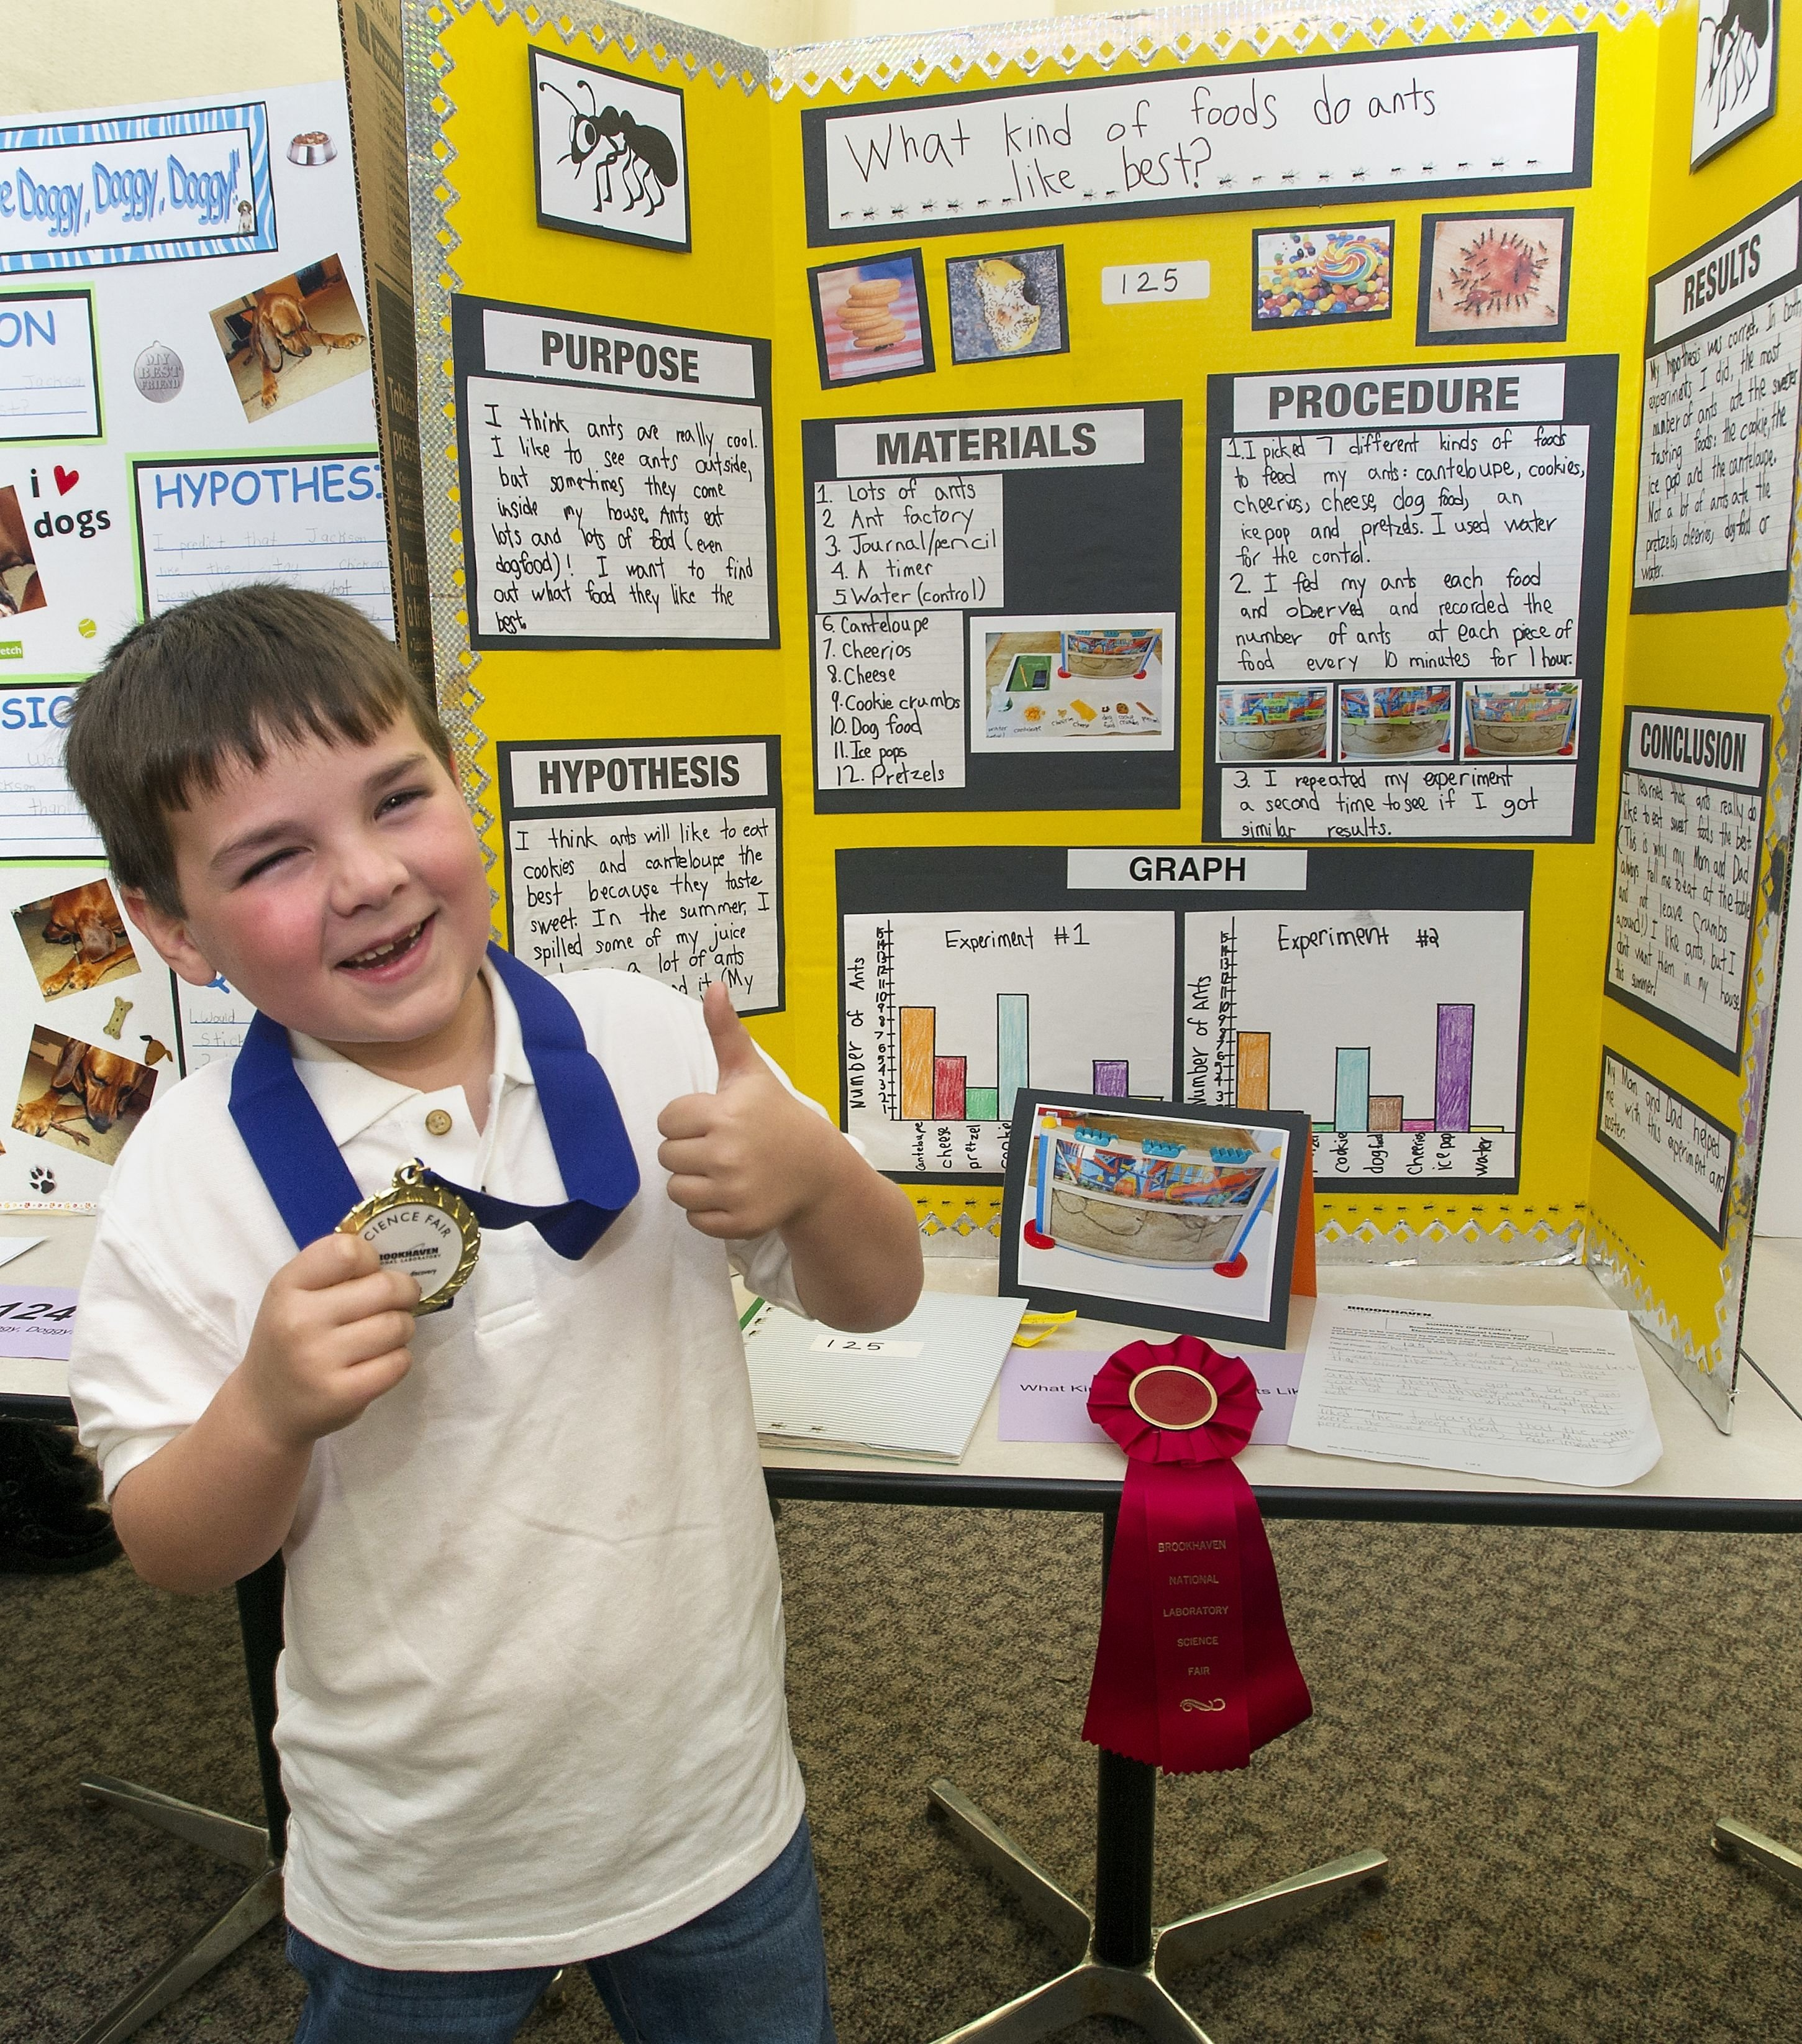 10 Fashionable Science Fair Ideas With Food ideas for reading fair projects kindergarten science fair project 1 2020